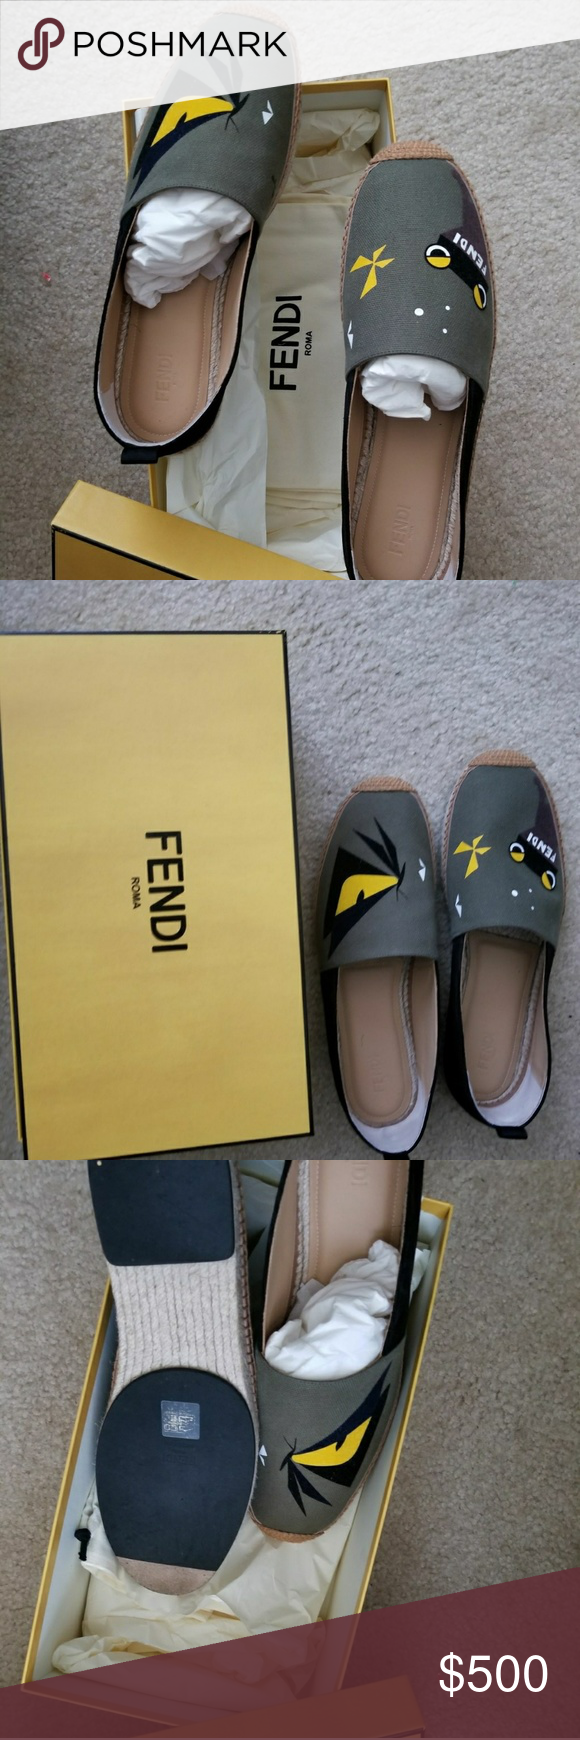 e416fc0e Fendi Shoes Espadrilles in grass green cotton canvas, featuring a ...